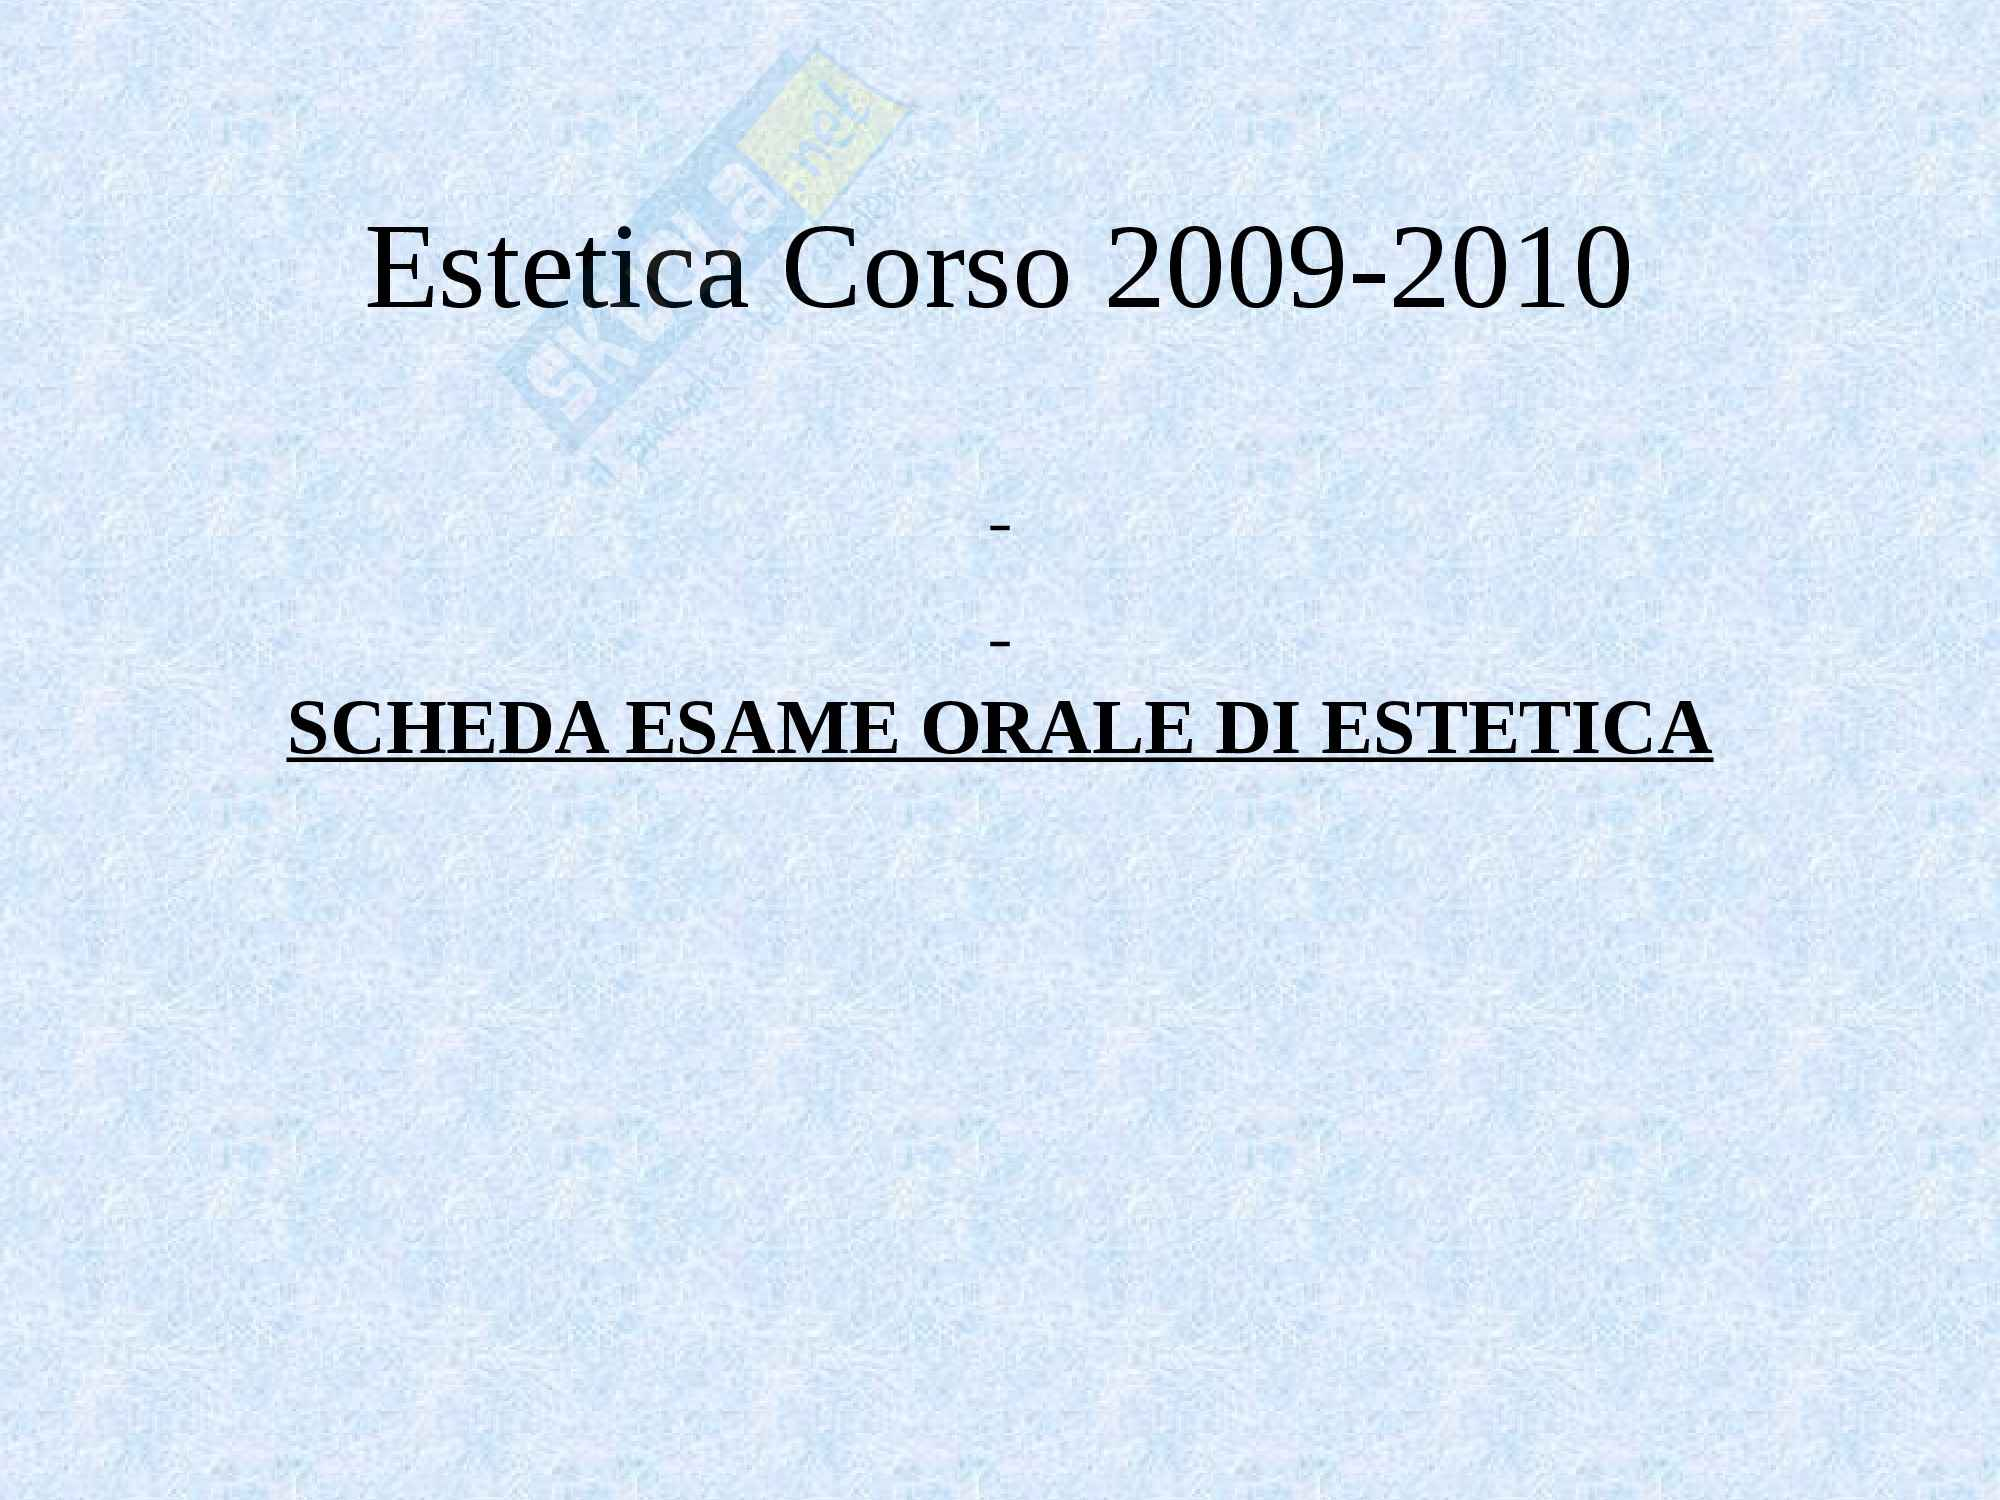 Estetica - lo studio dell'estetica Pag. 16